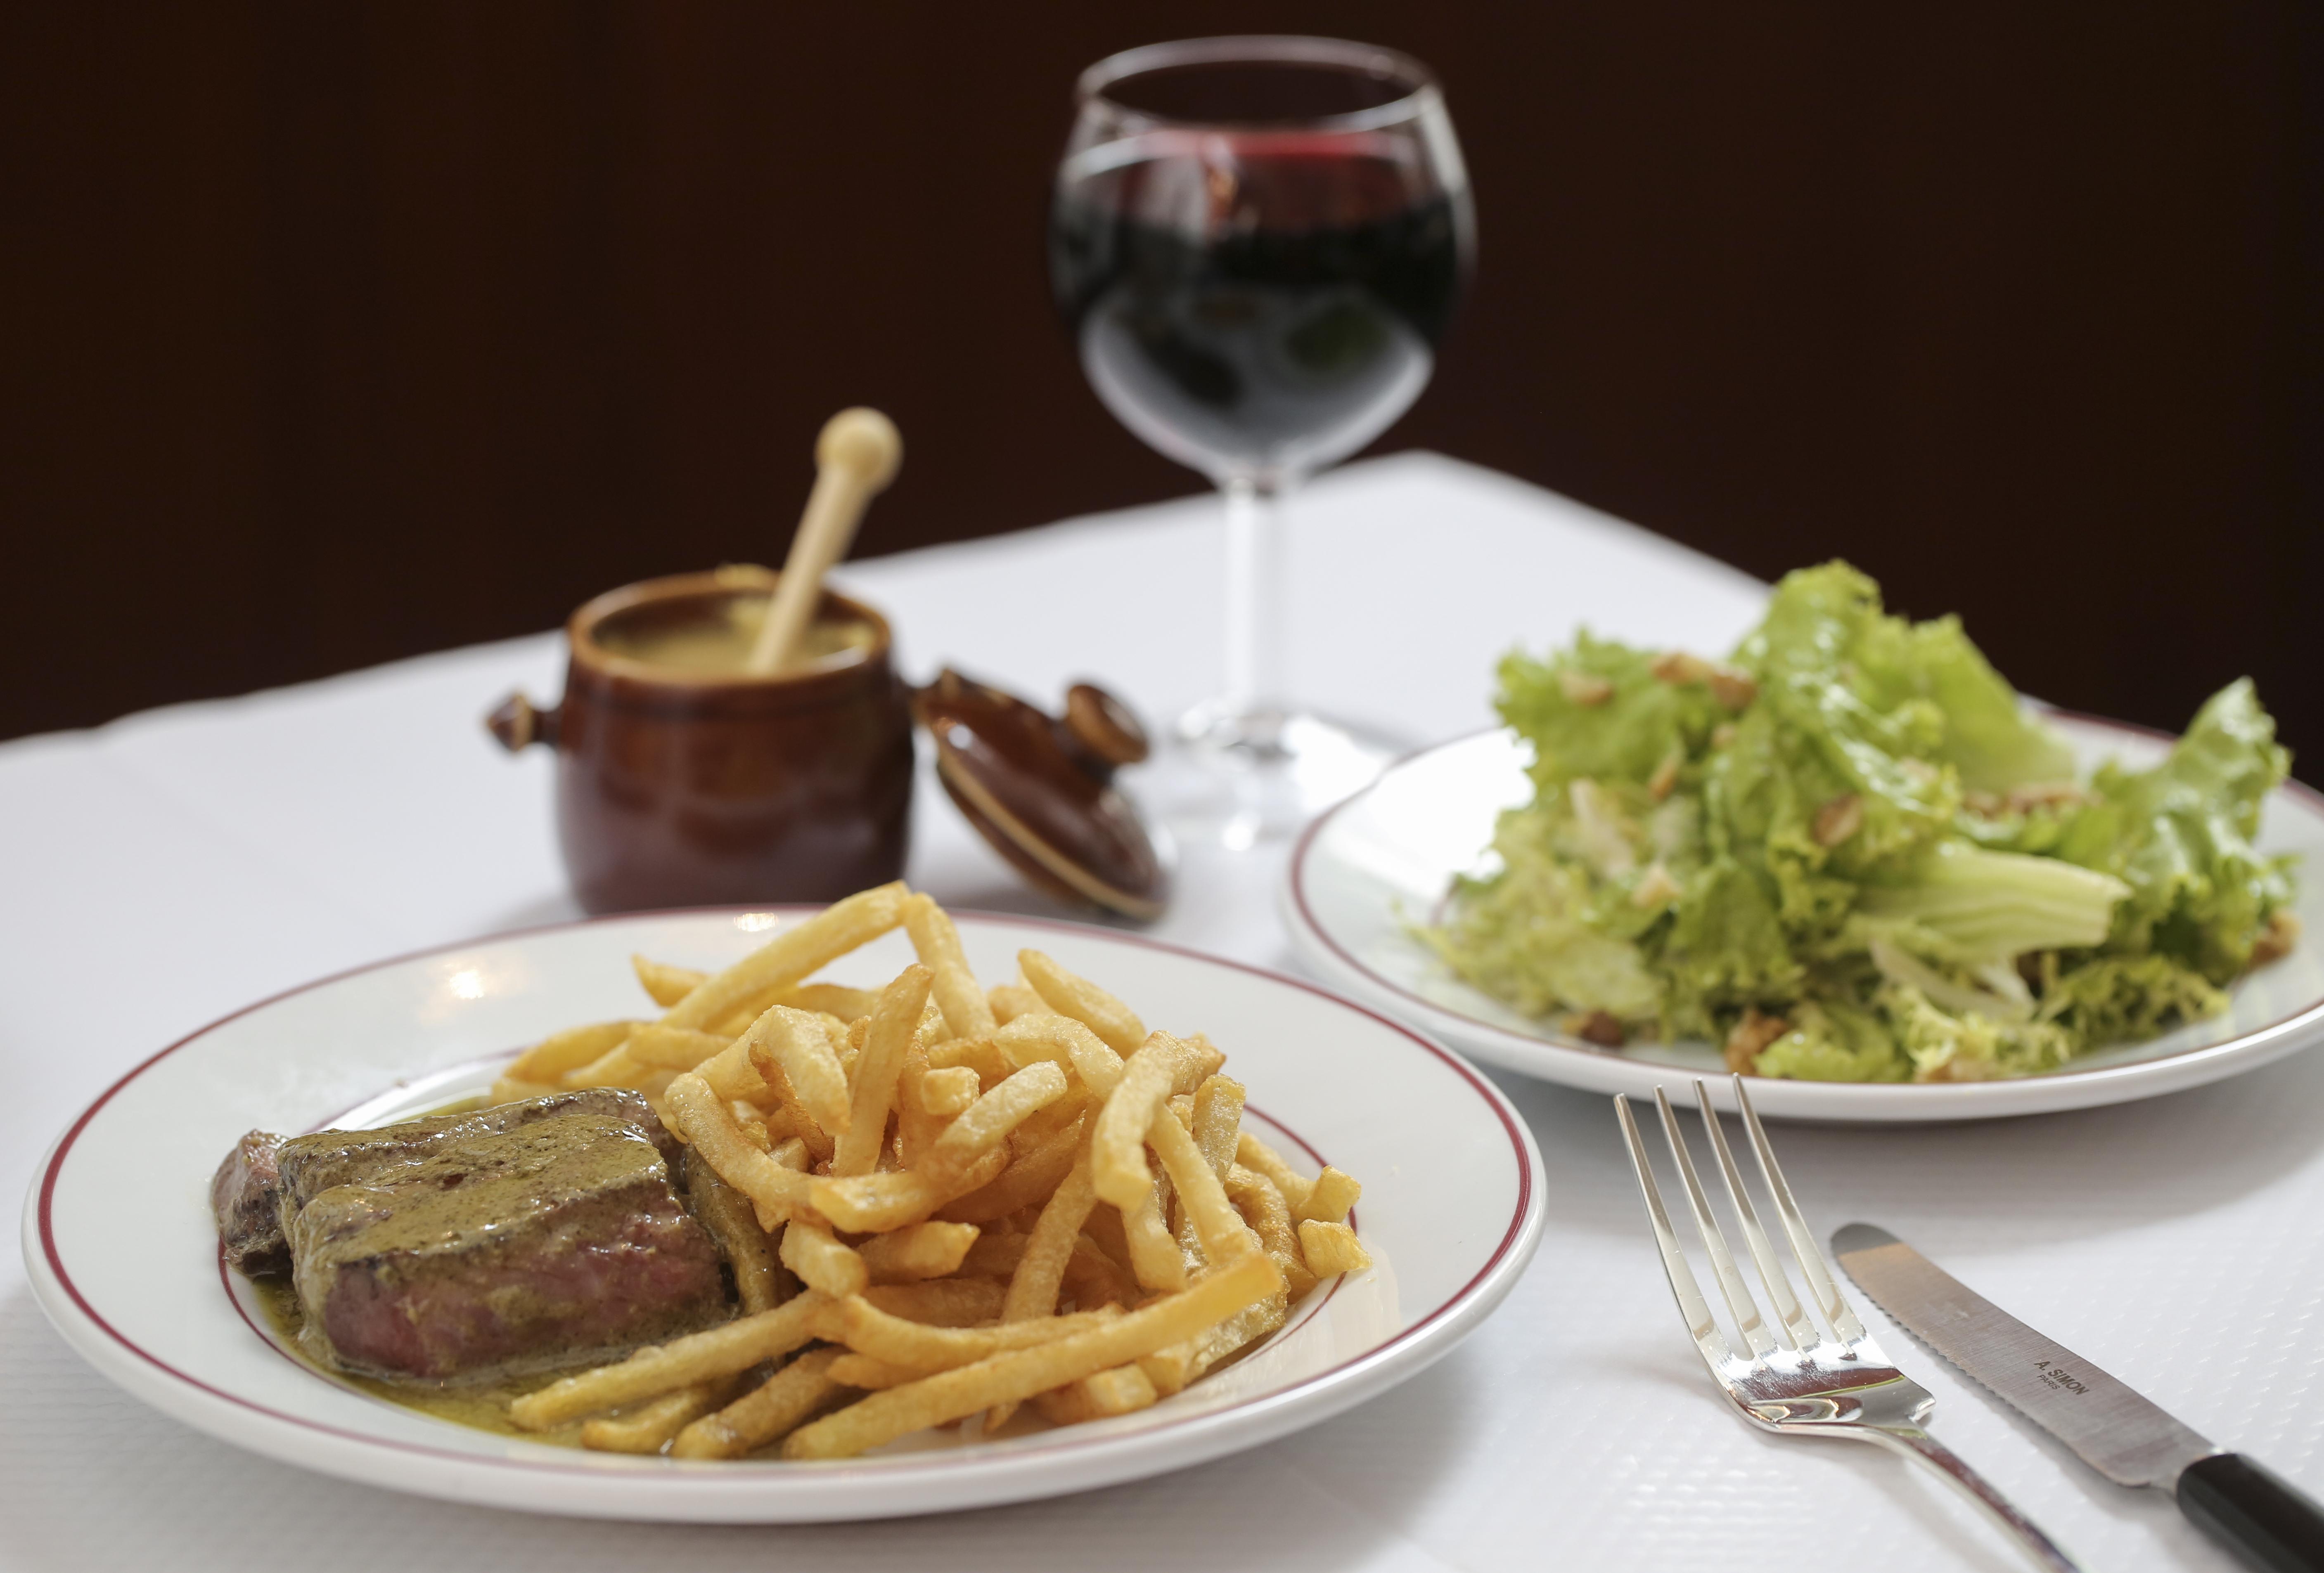 Steak frites, a dish of Le Relais de l'Entrecote at Wan Chai. 14OCT14. [23OCTOBER2014 LEAD FEATURE 1 48HRS]